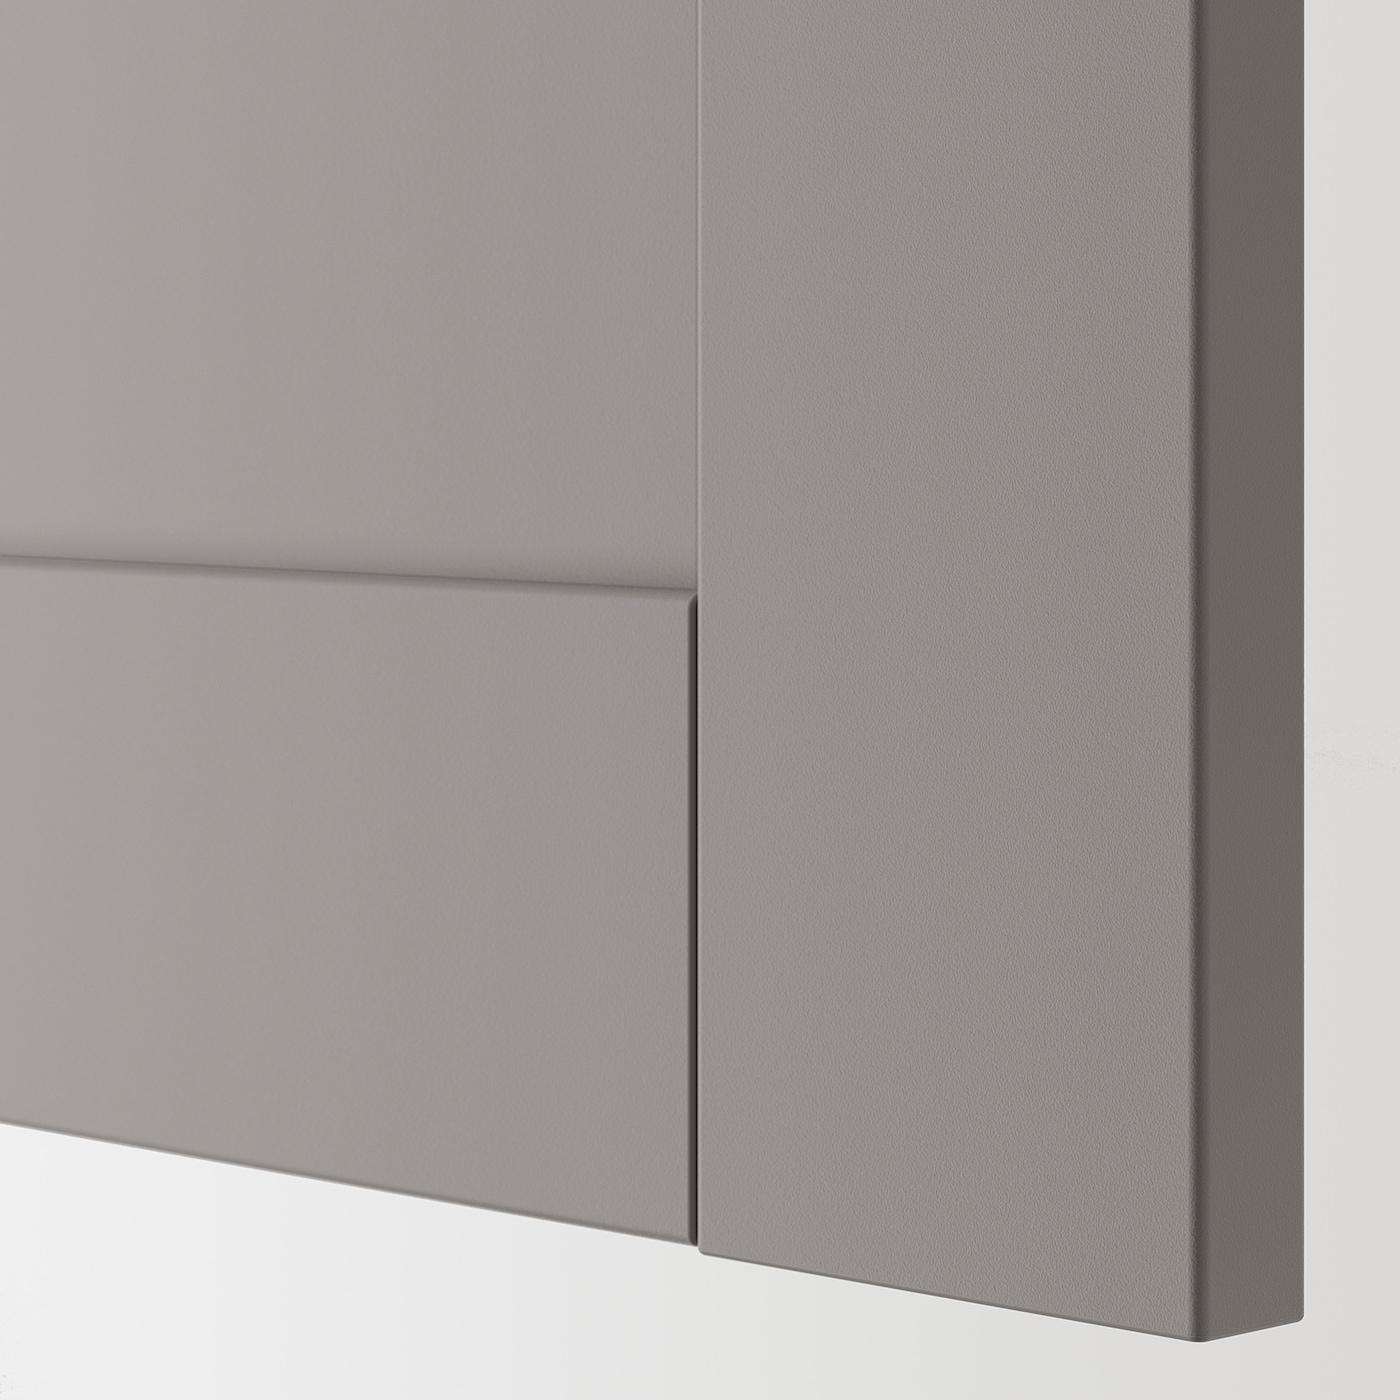 ENHET Vægsk 2 hyld/låge, hvid/grå stel, 60x32x75 cm